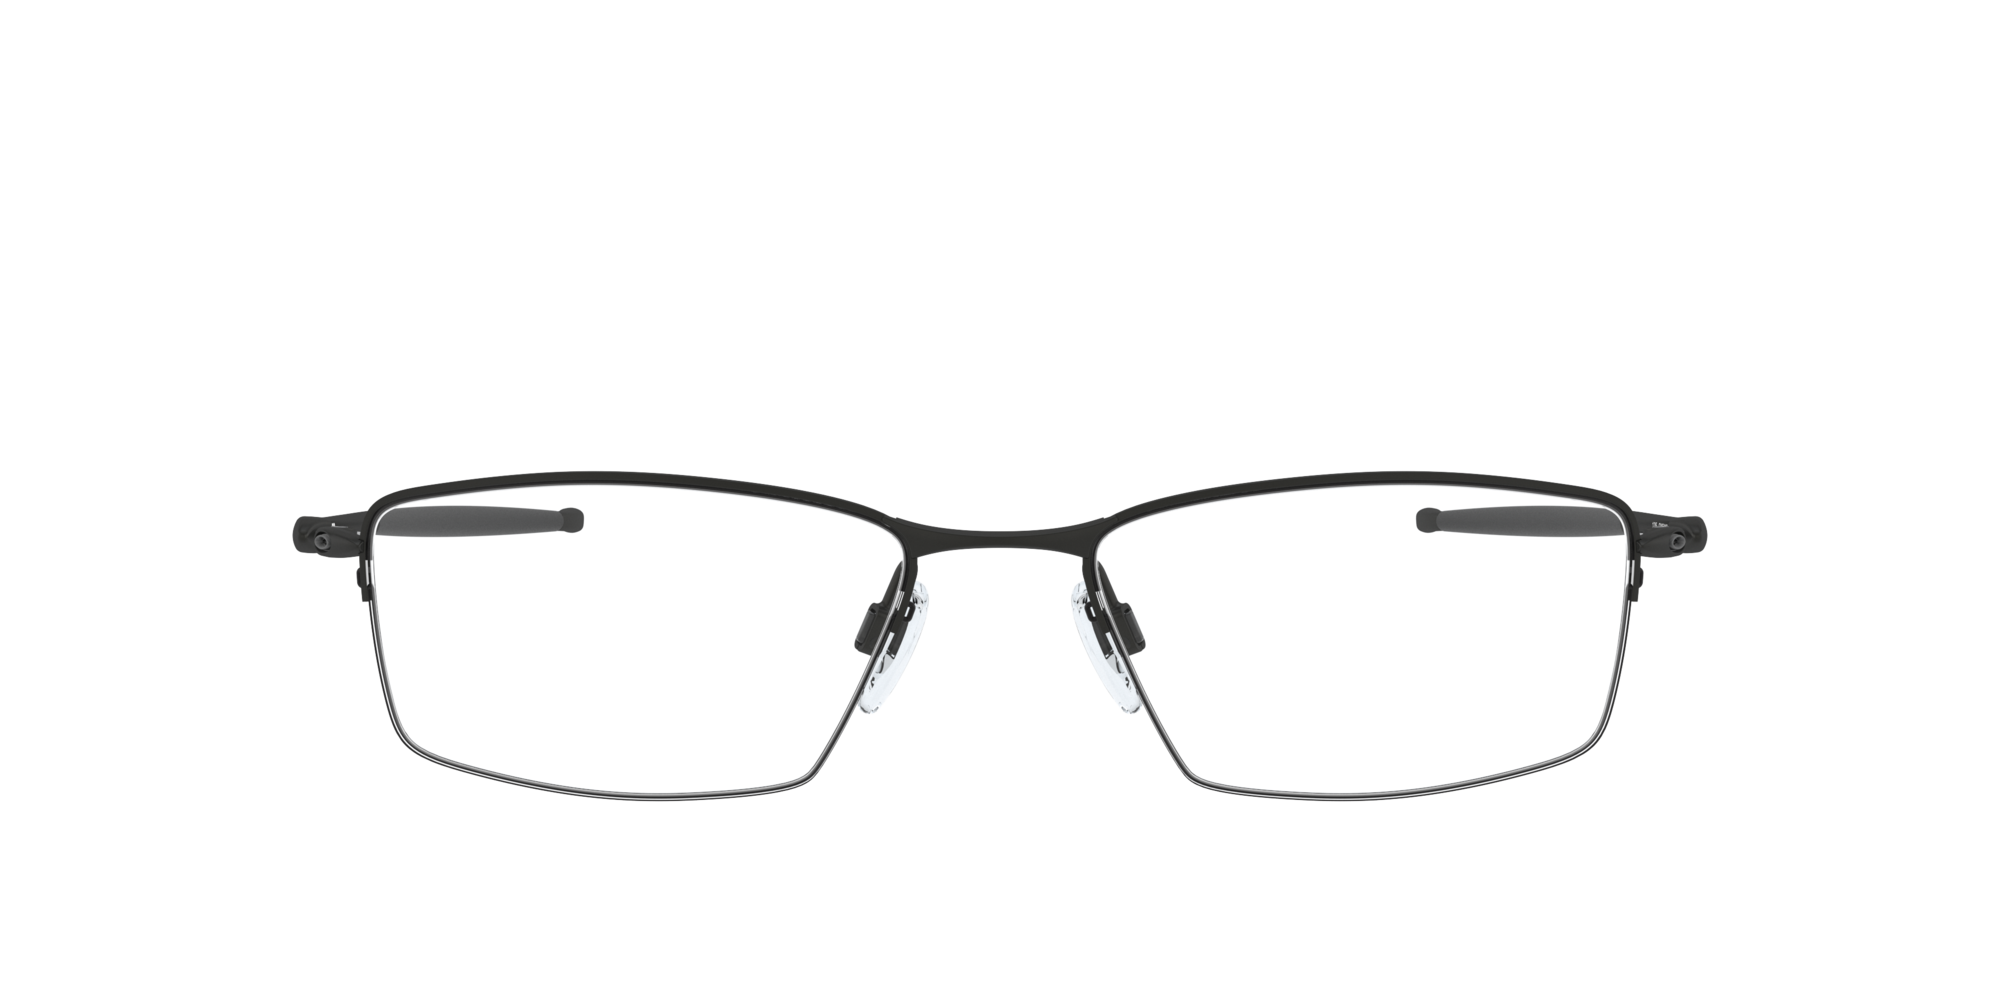 Image for OX5113 LIZARD from LensCrafters | Glasses, Prescription Glasses Online, Eyewear